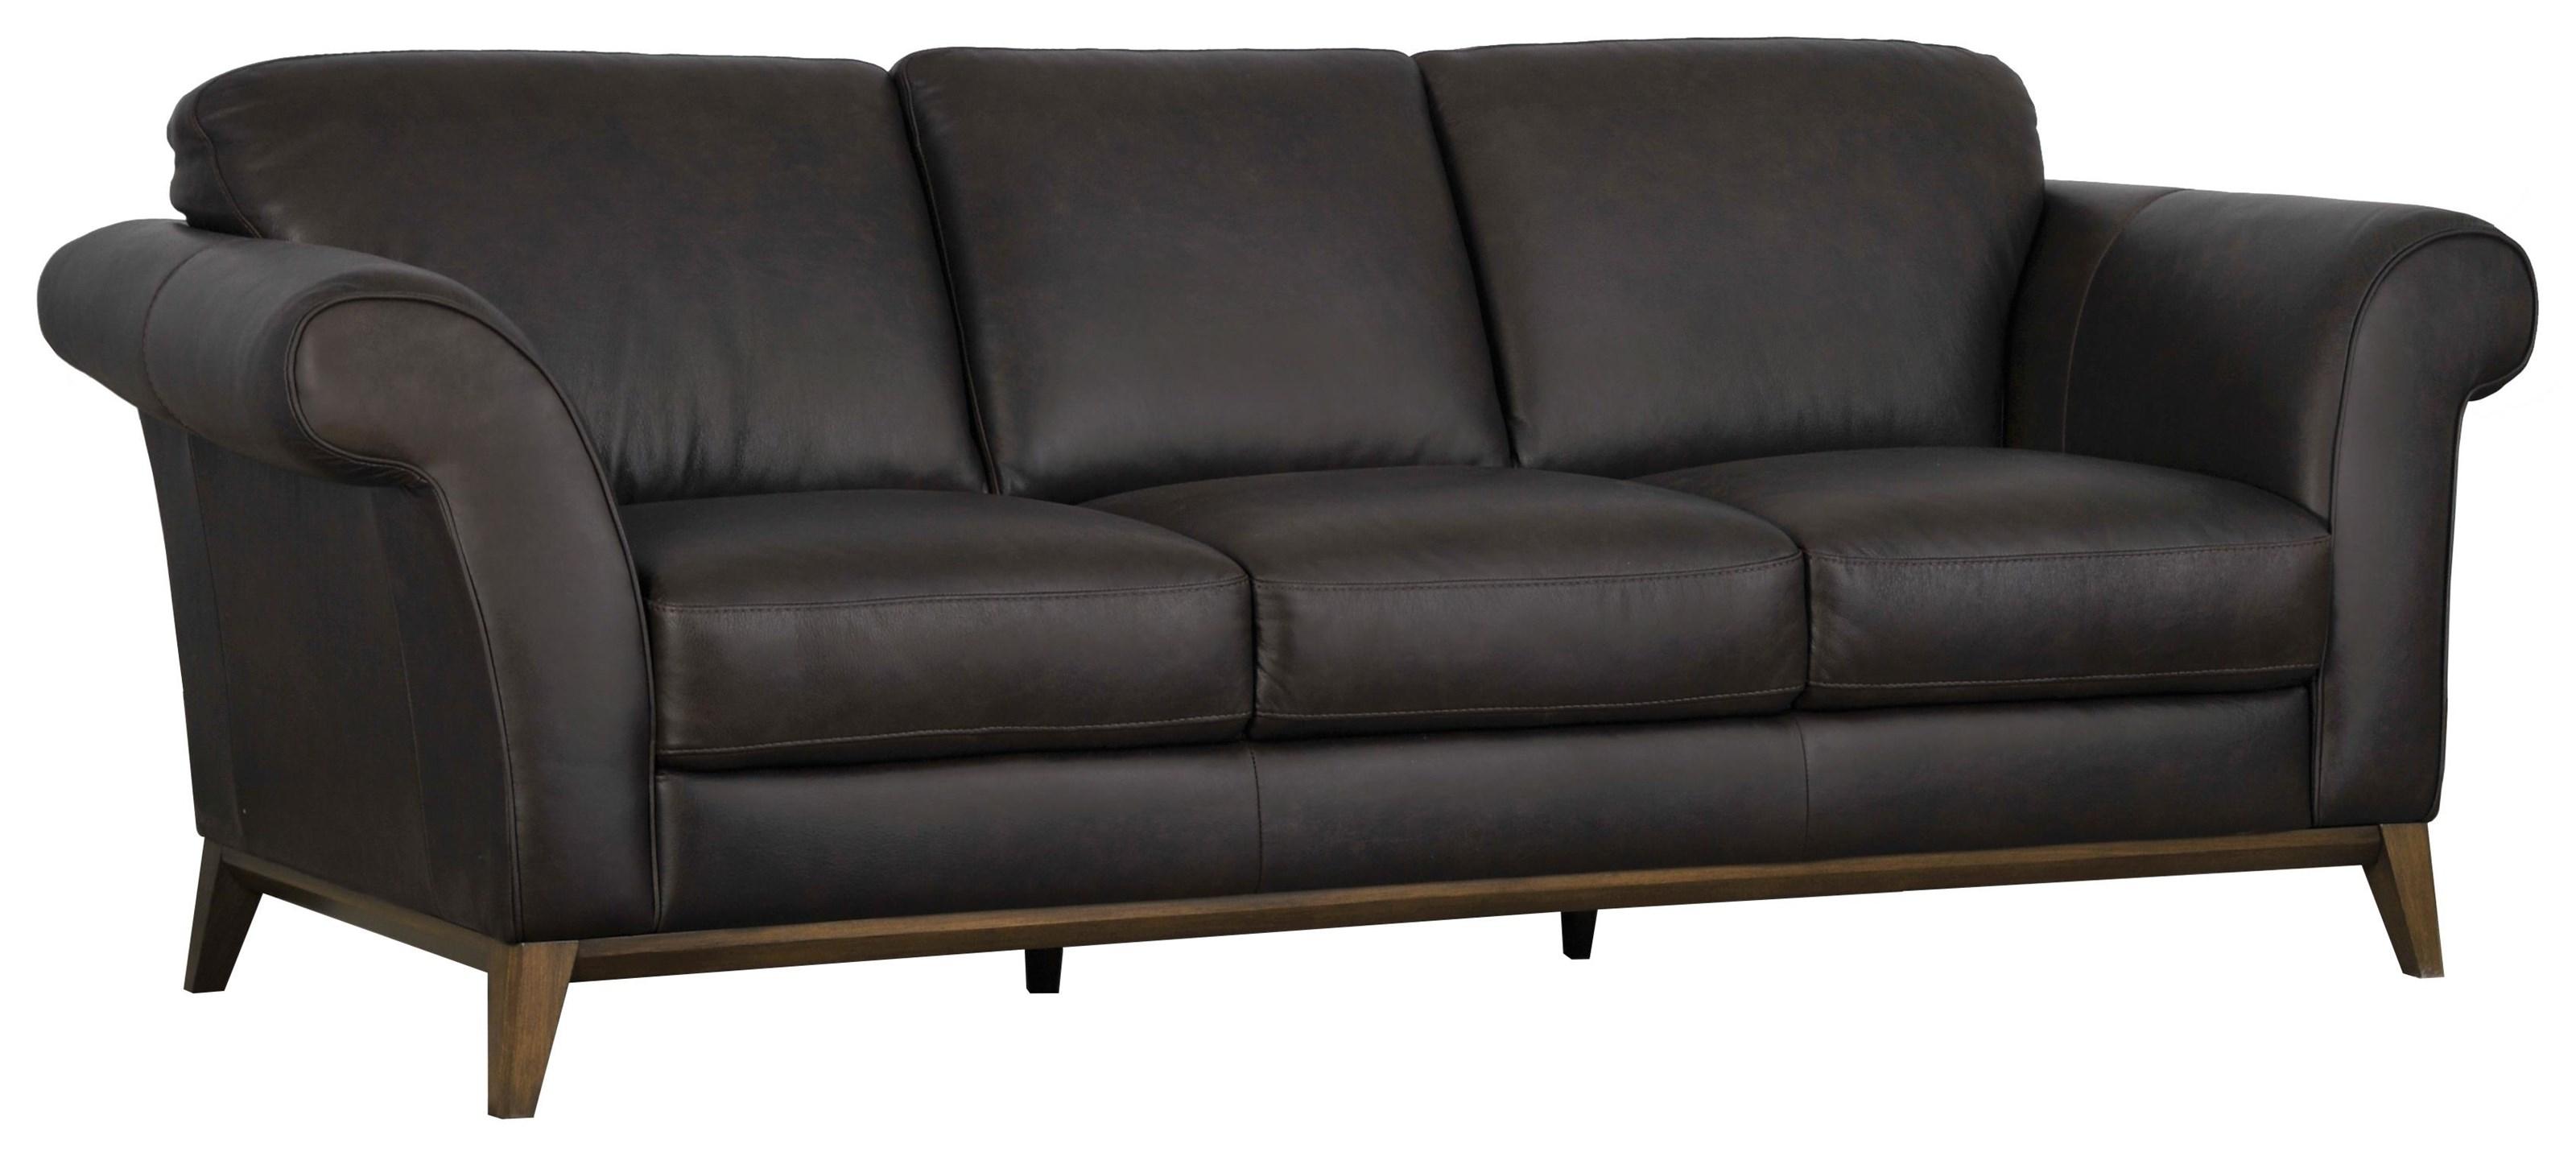 C058 Sofa by Natuzzi Editions at Sadler's Home Furnishings